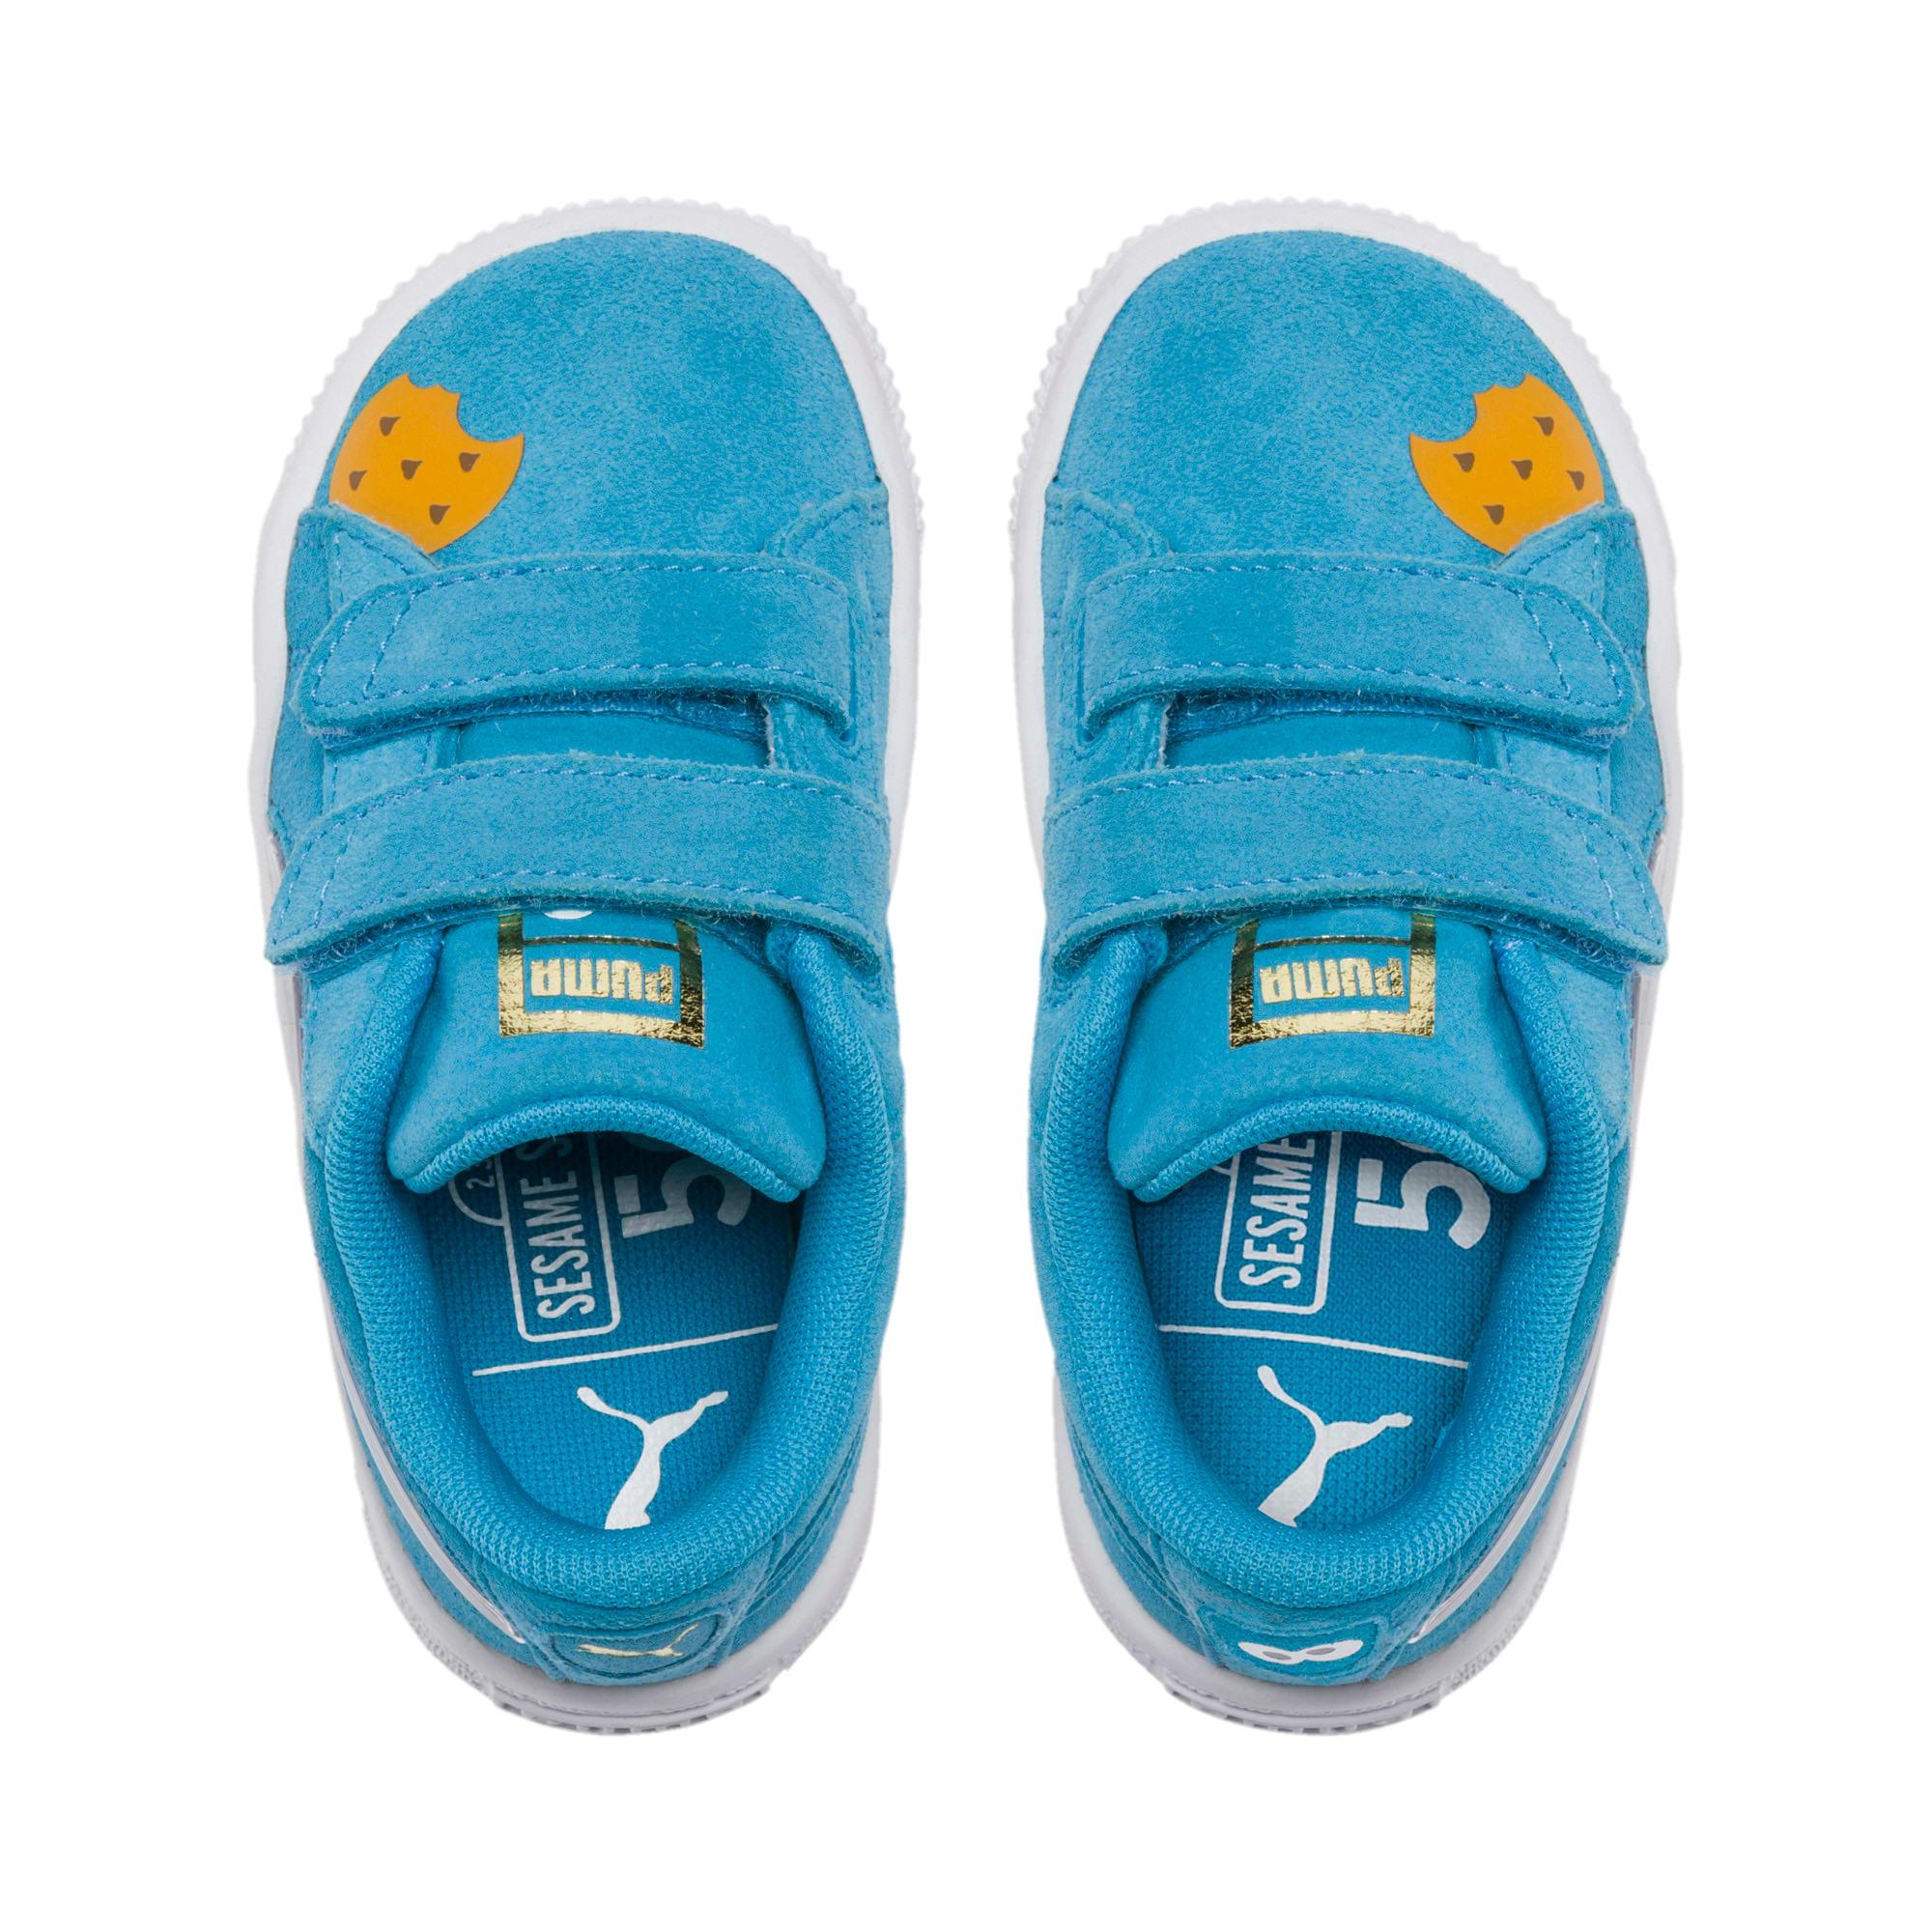 Thumbnail 6 of PUMA x SESAME STREET 50 Suede Statement Toddler Shoes, Bleu Azur-Puma White, medium